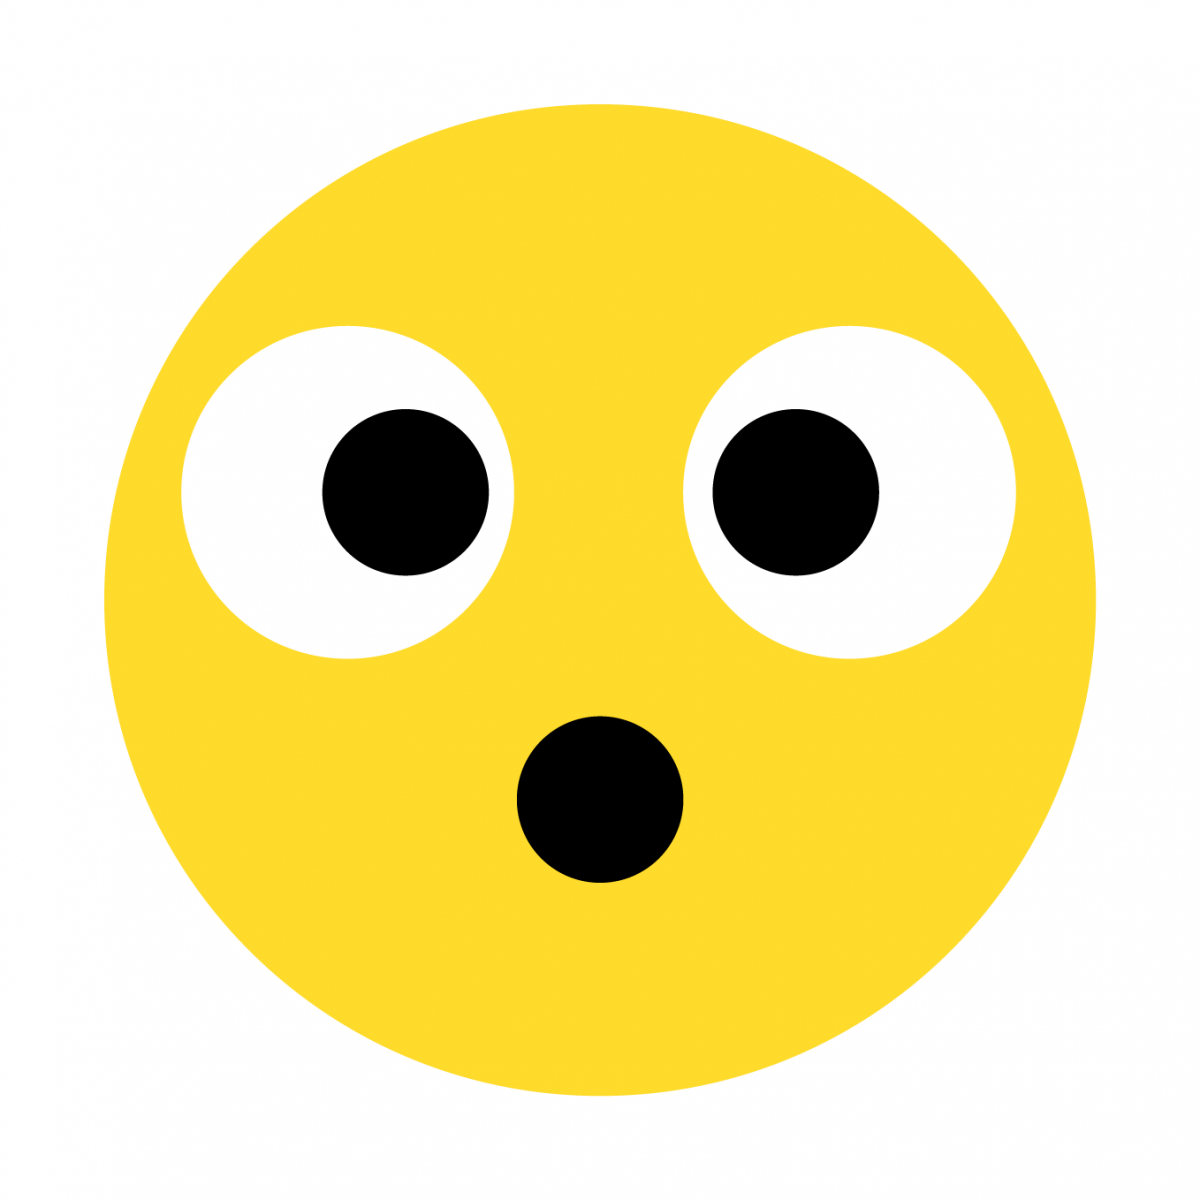 knoooop-sortiment Startseite_smileyoha